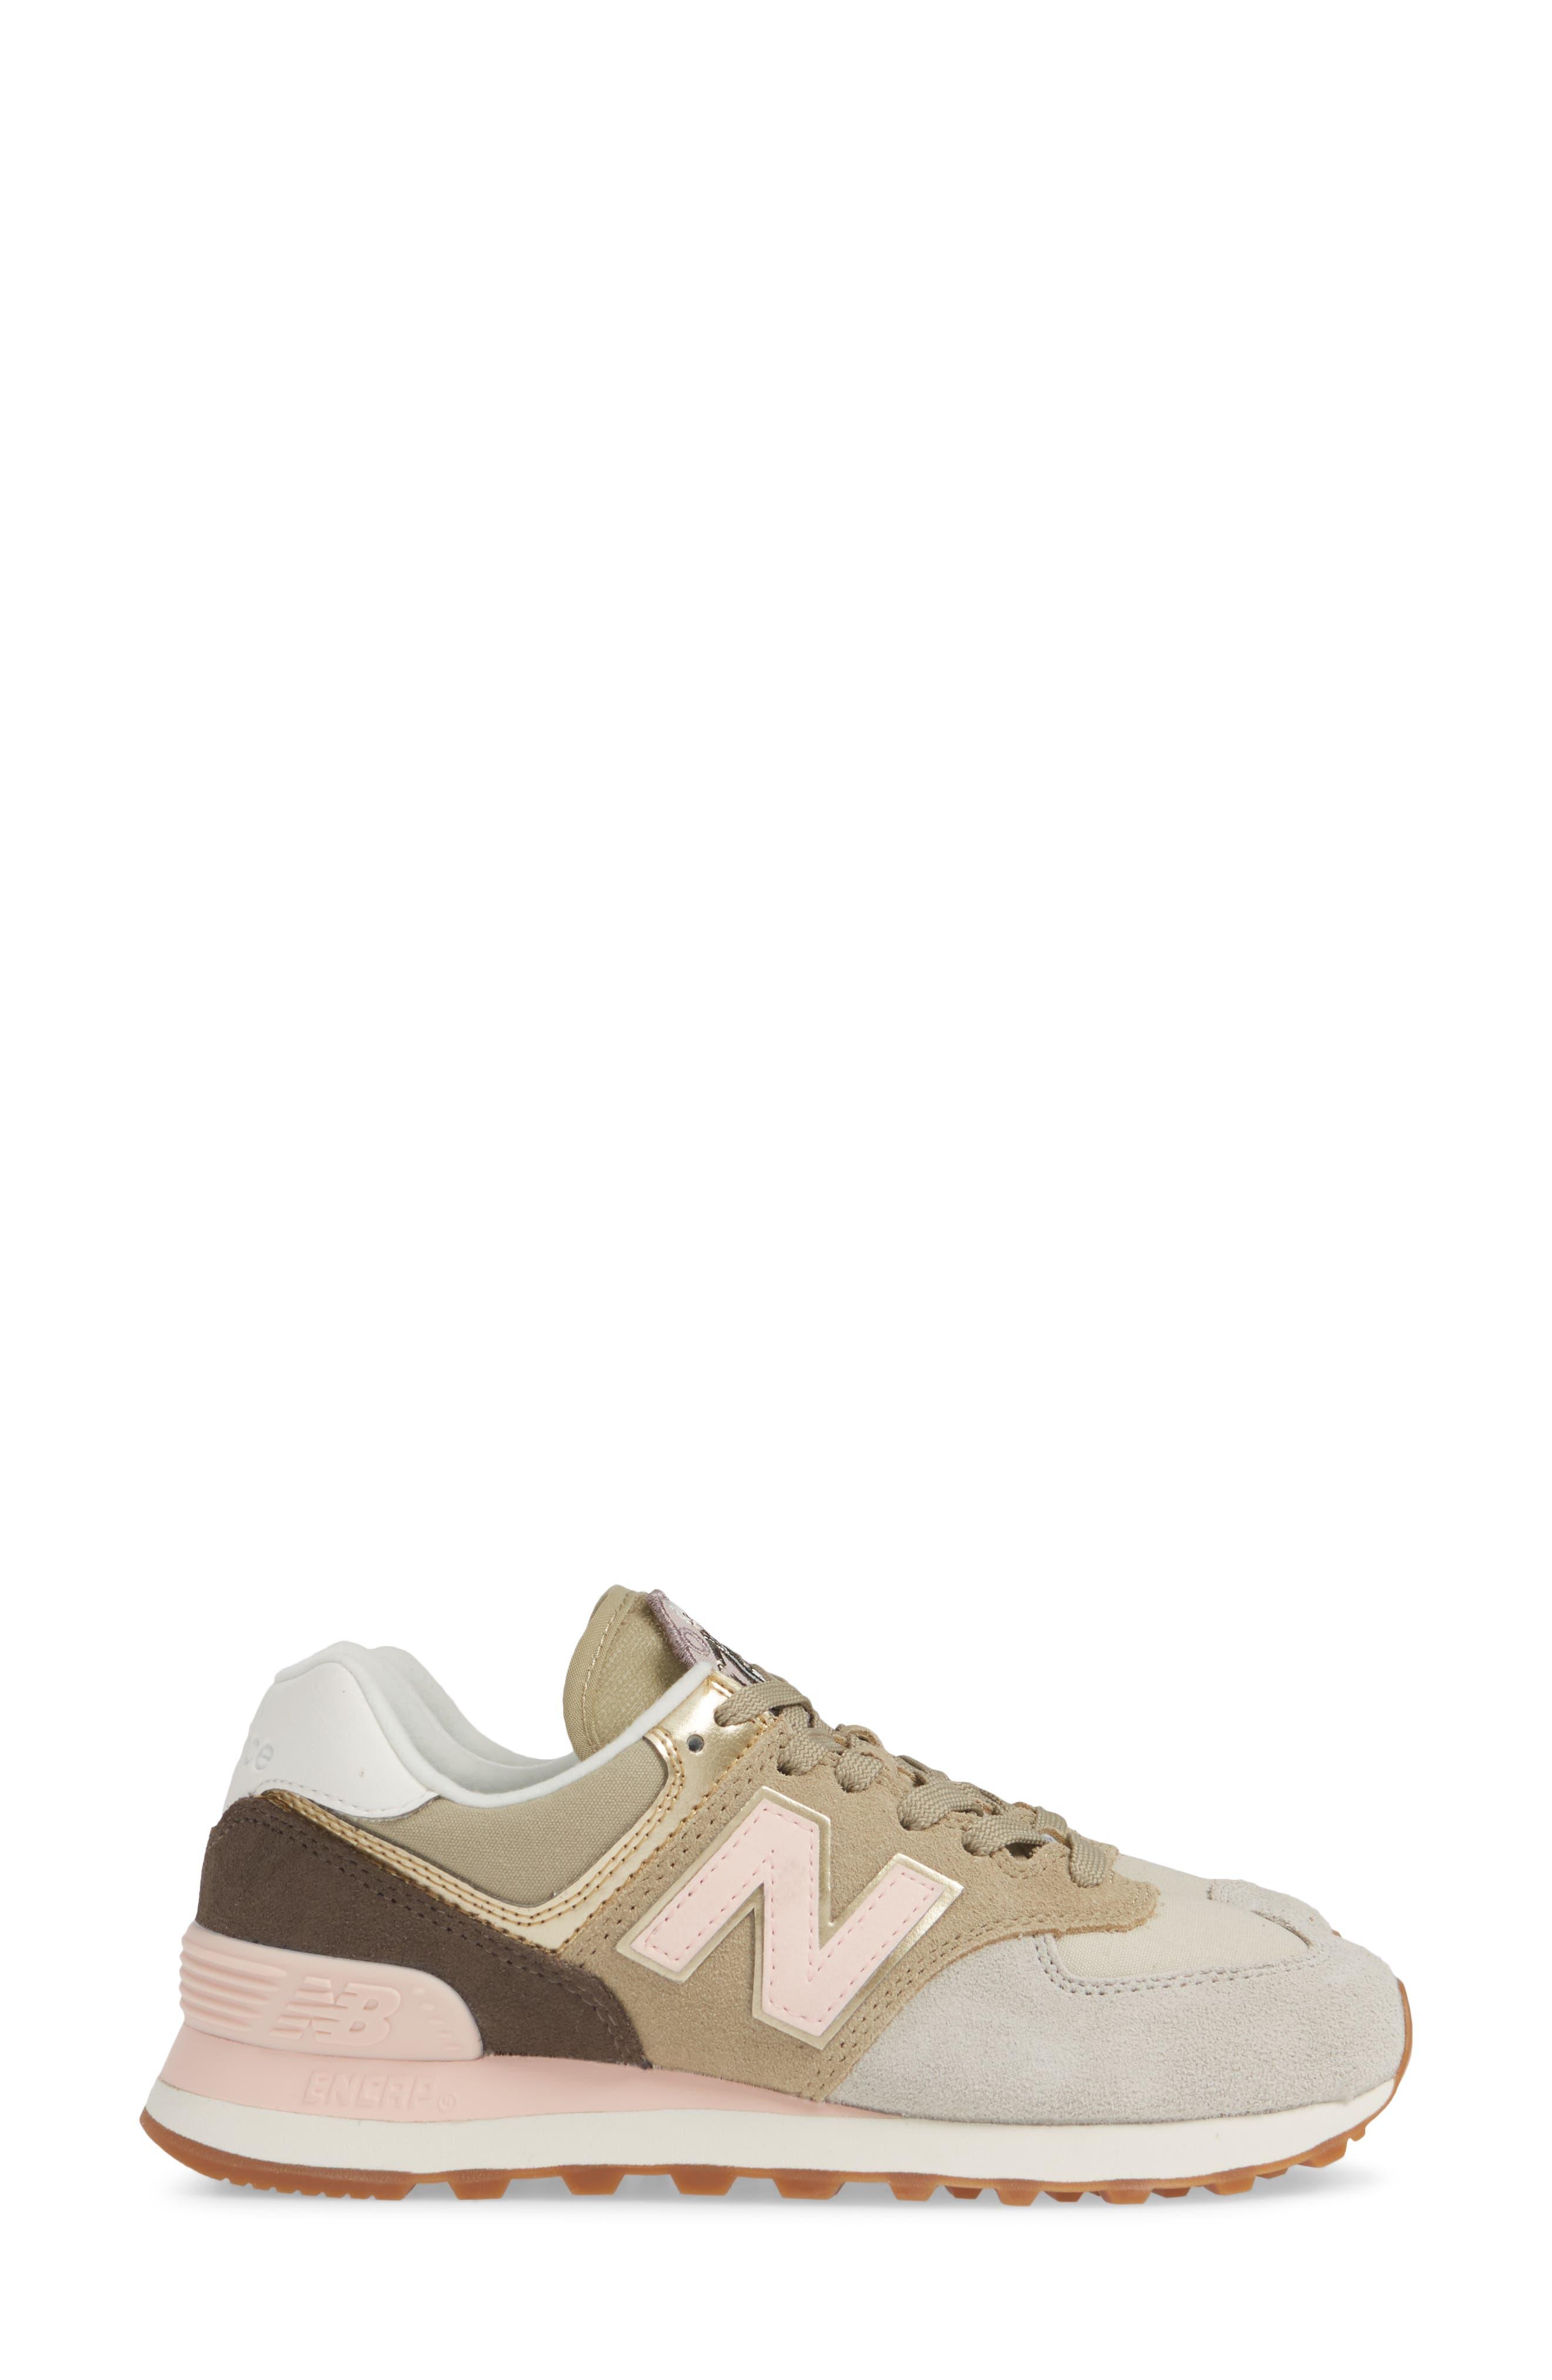 NEW BALANCE, 574 Metallic Patch Sneaker, Alternate thumbnail 3, color, LIGHT CLIFF GREY